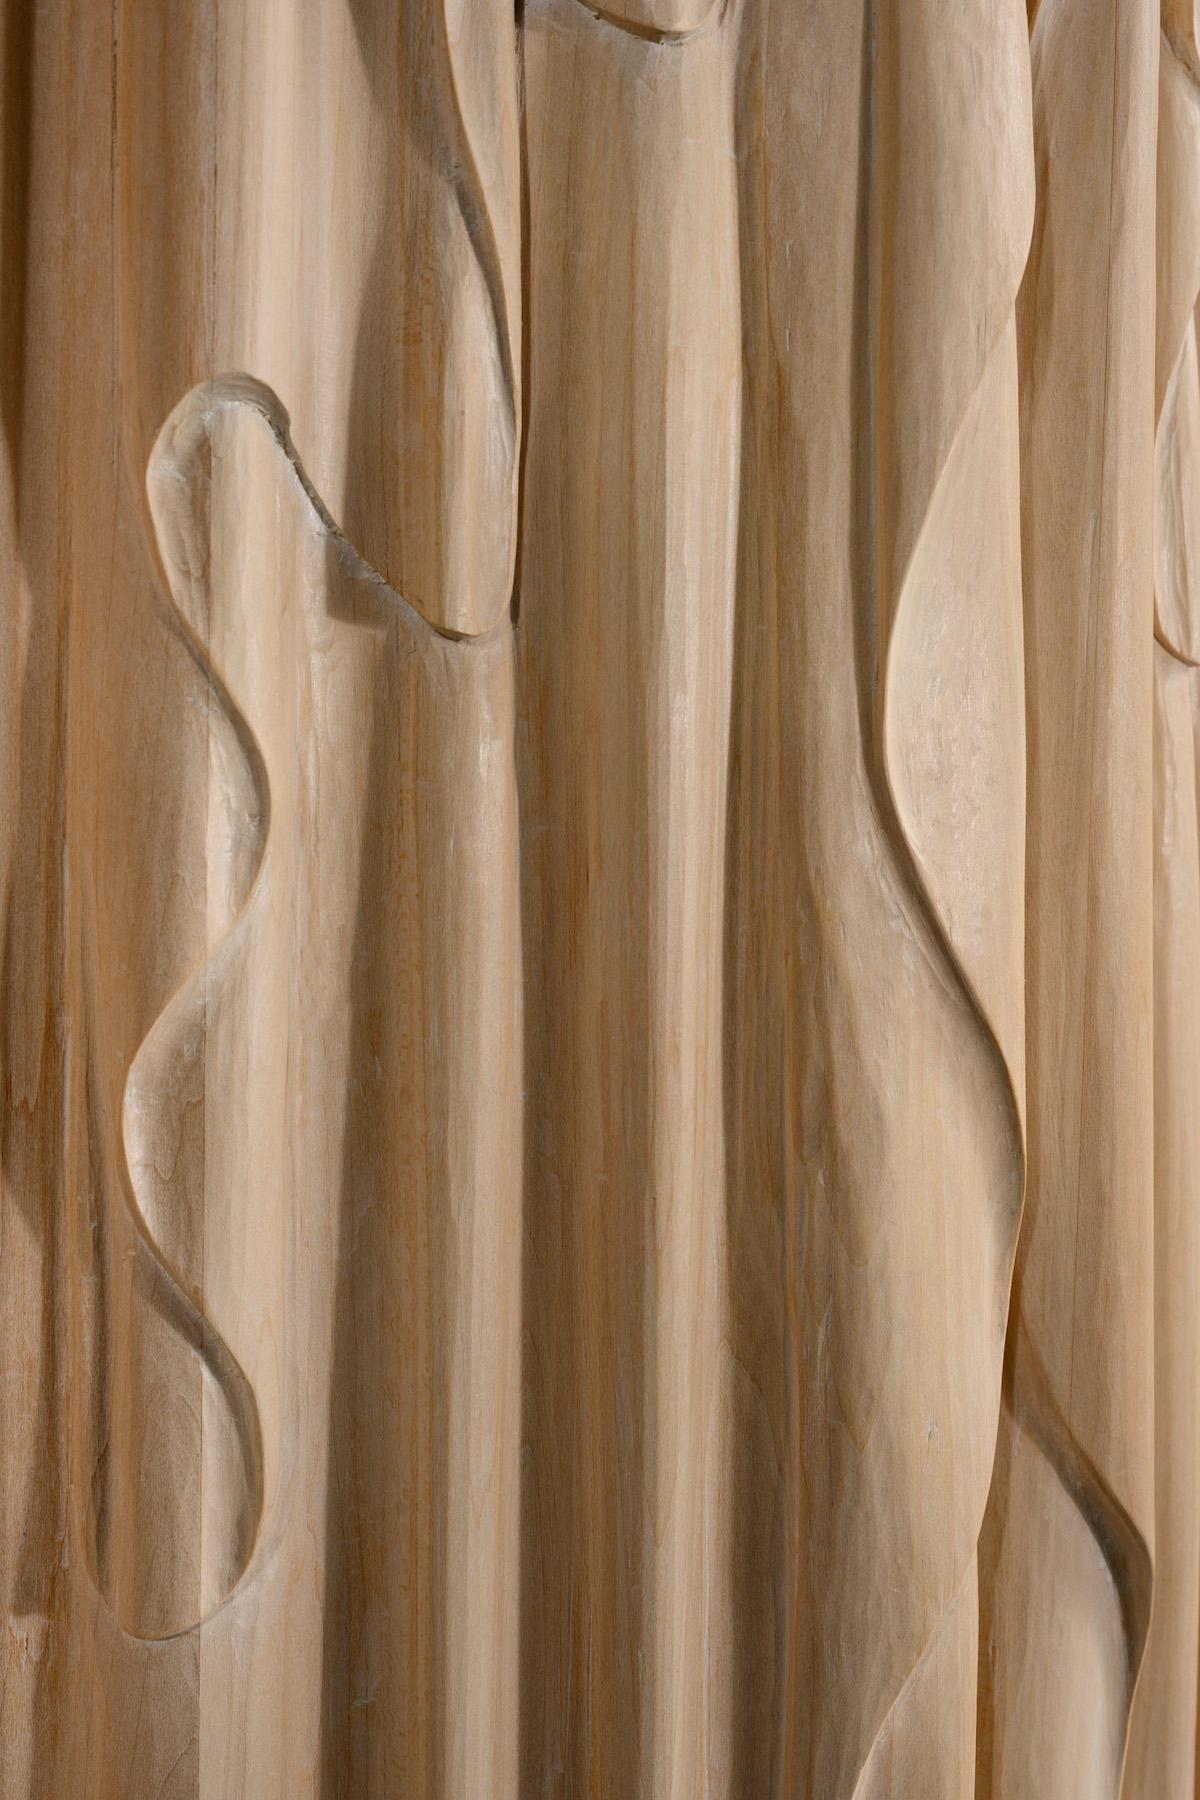 door detail of Linenfold Armoire (Perpendicular Style) by artist Christopher Kurtz